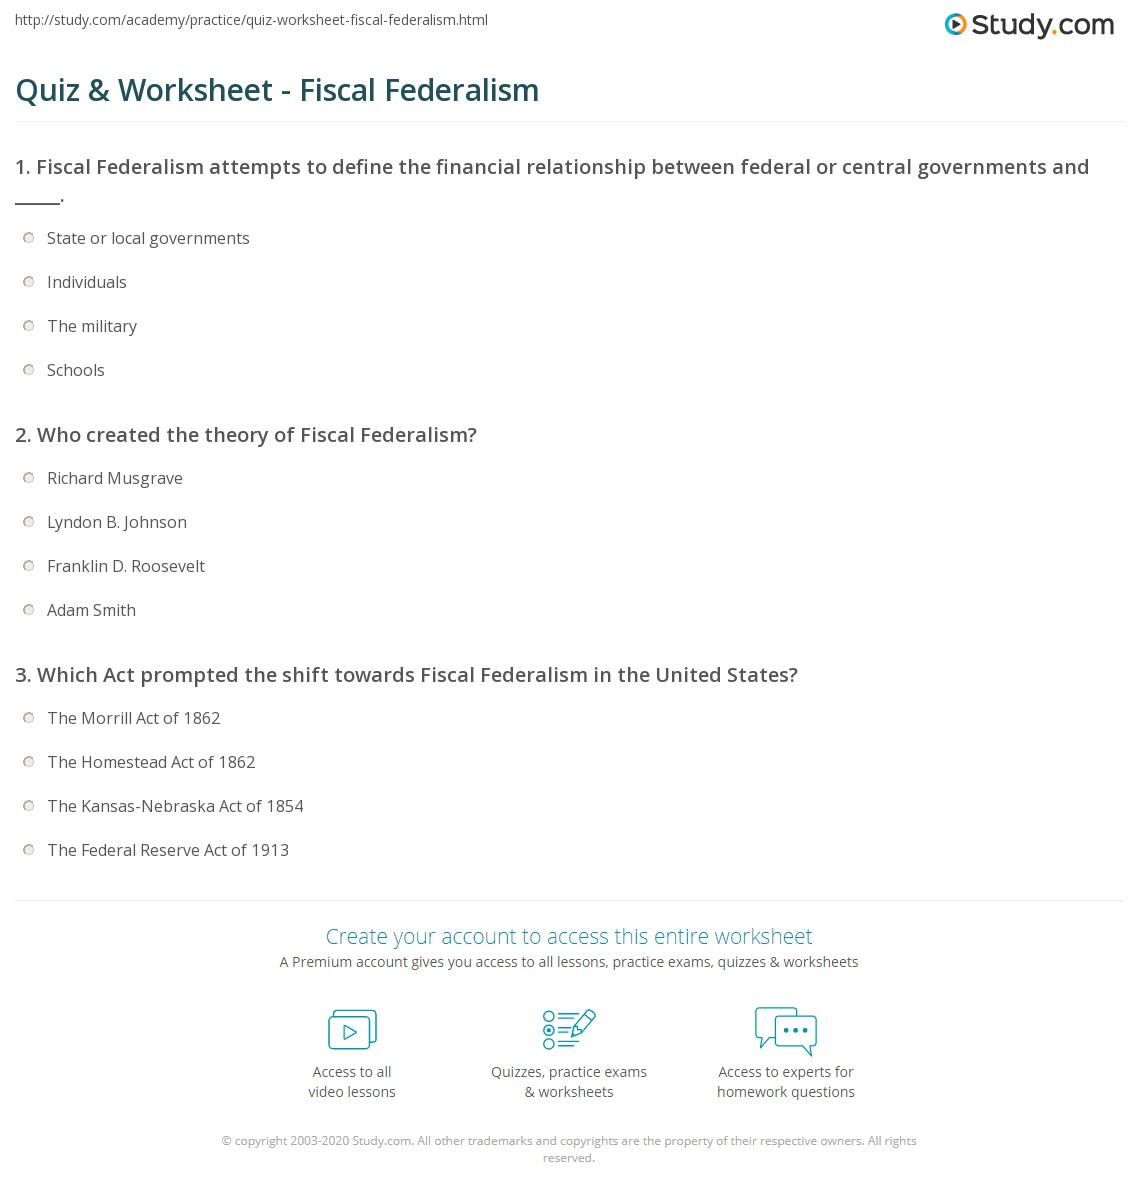 Quiz & Worksheet - Fiscal Federalism | Study.com